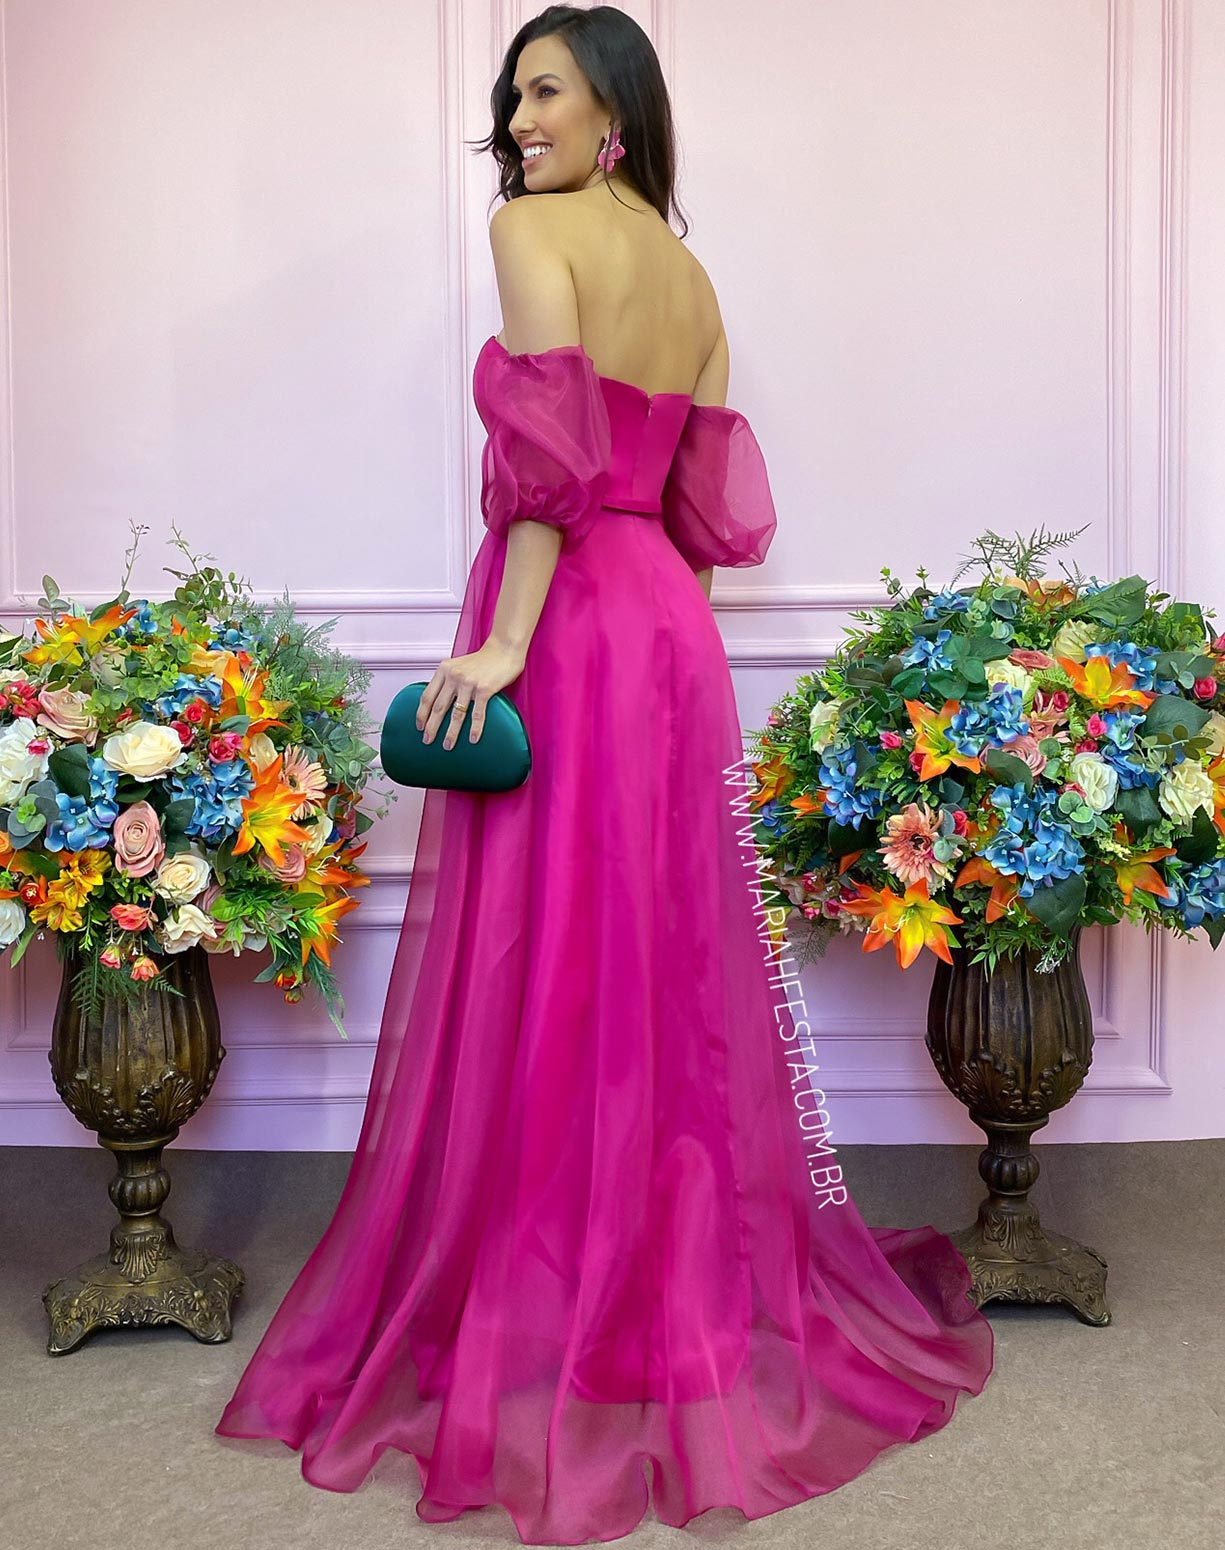 Vestido Rosa Pink em Organza